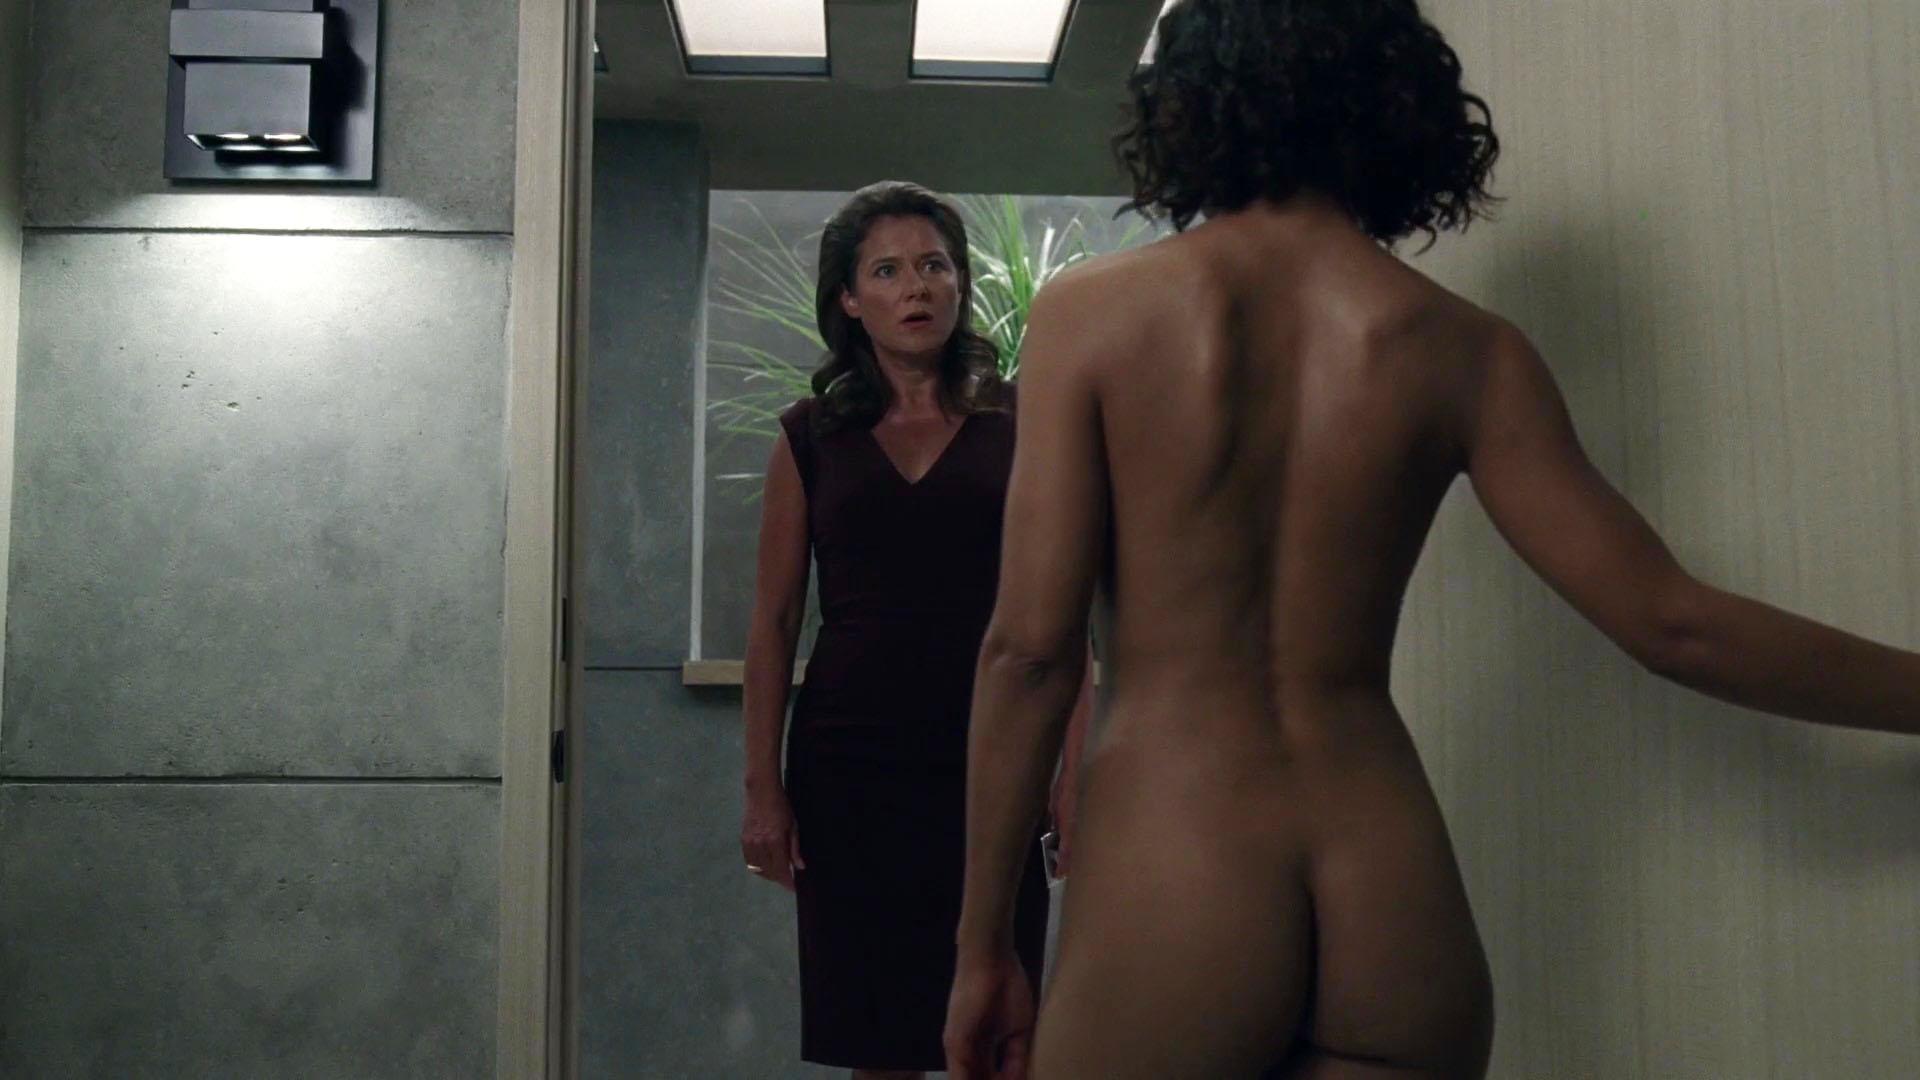 Ingrid Bolsø Berdal Naked westworld nude scenes » celebs nude video - nudecelebvideo